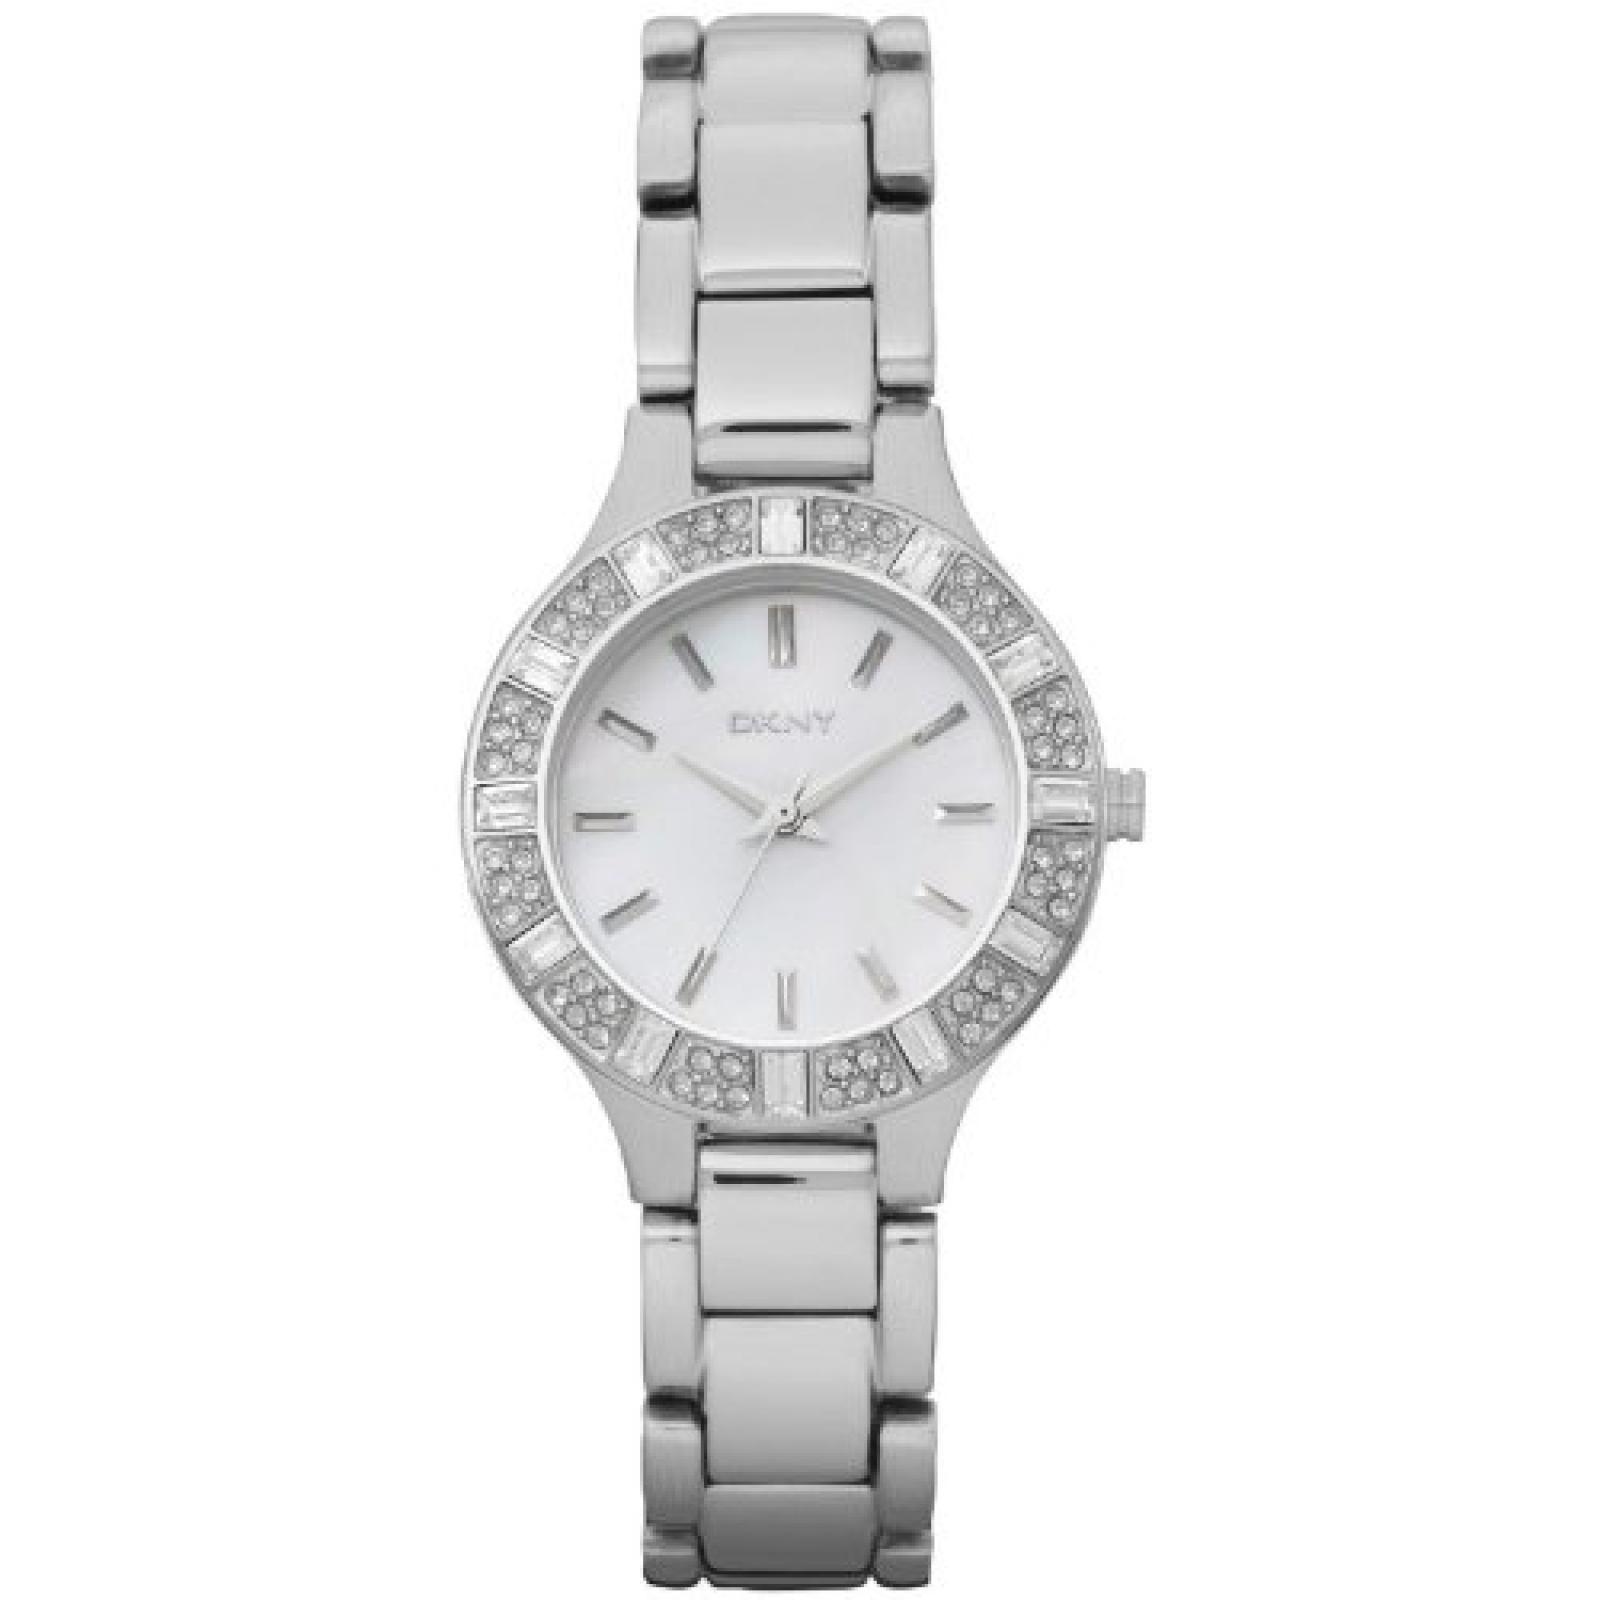 Esprit Herren-Armbanduhr Analog Quarz One Size, schwarz, silber